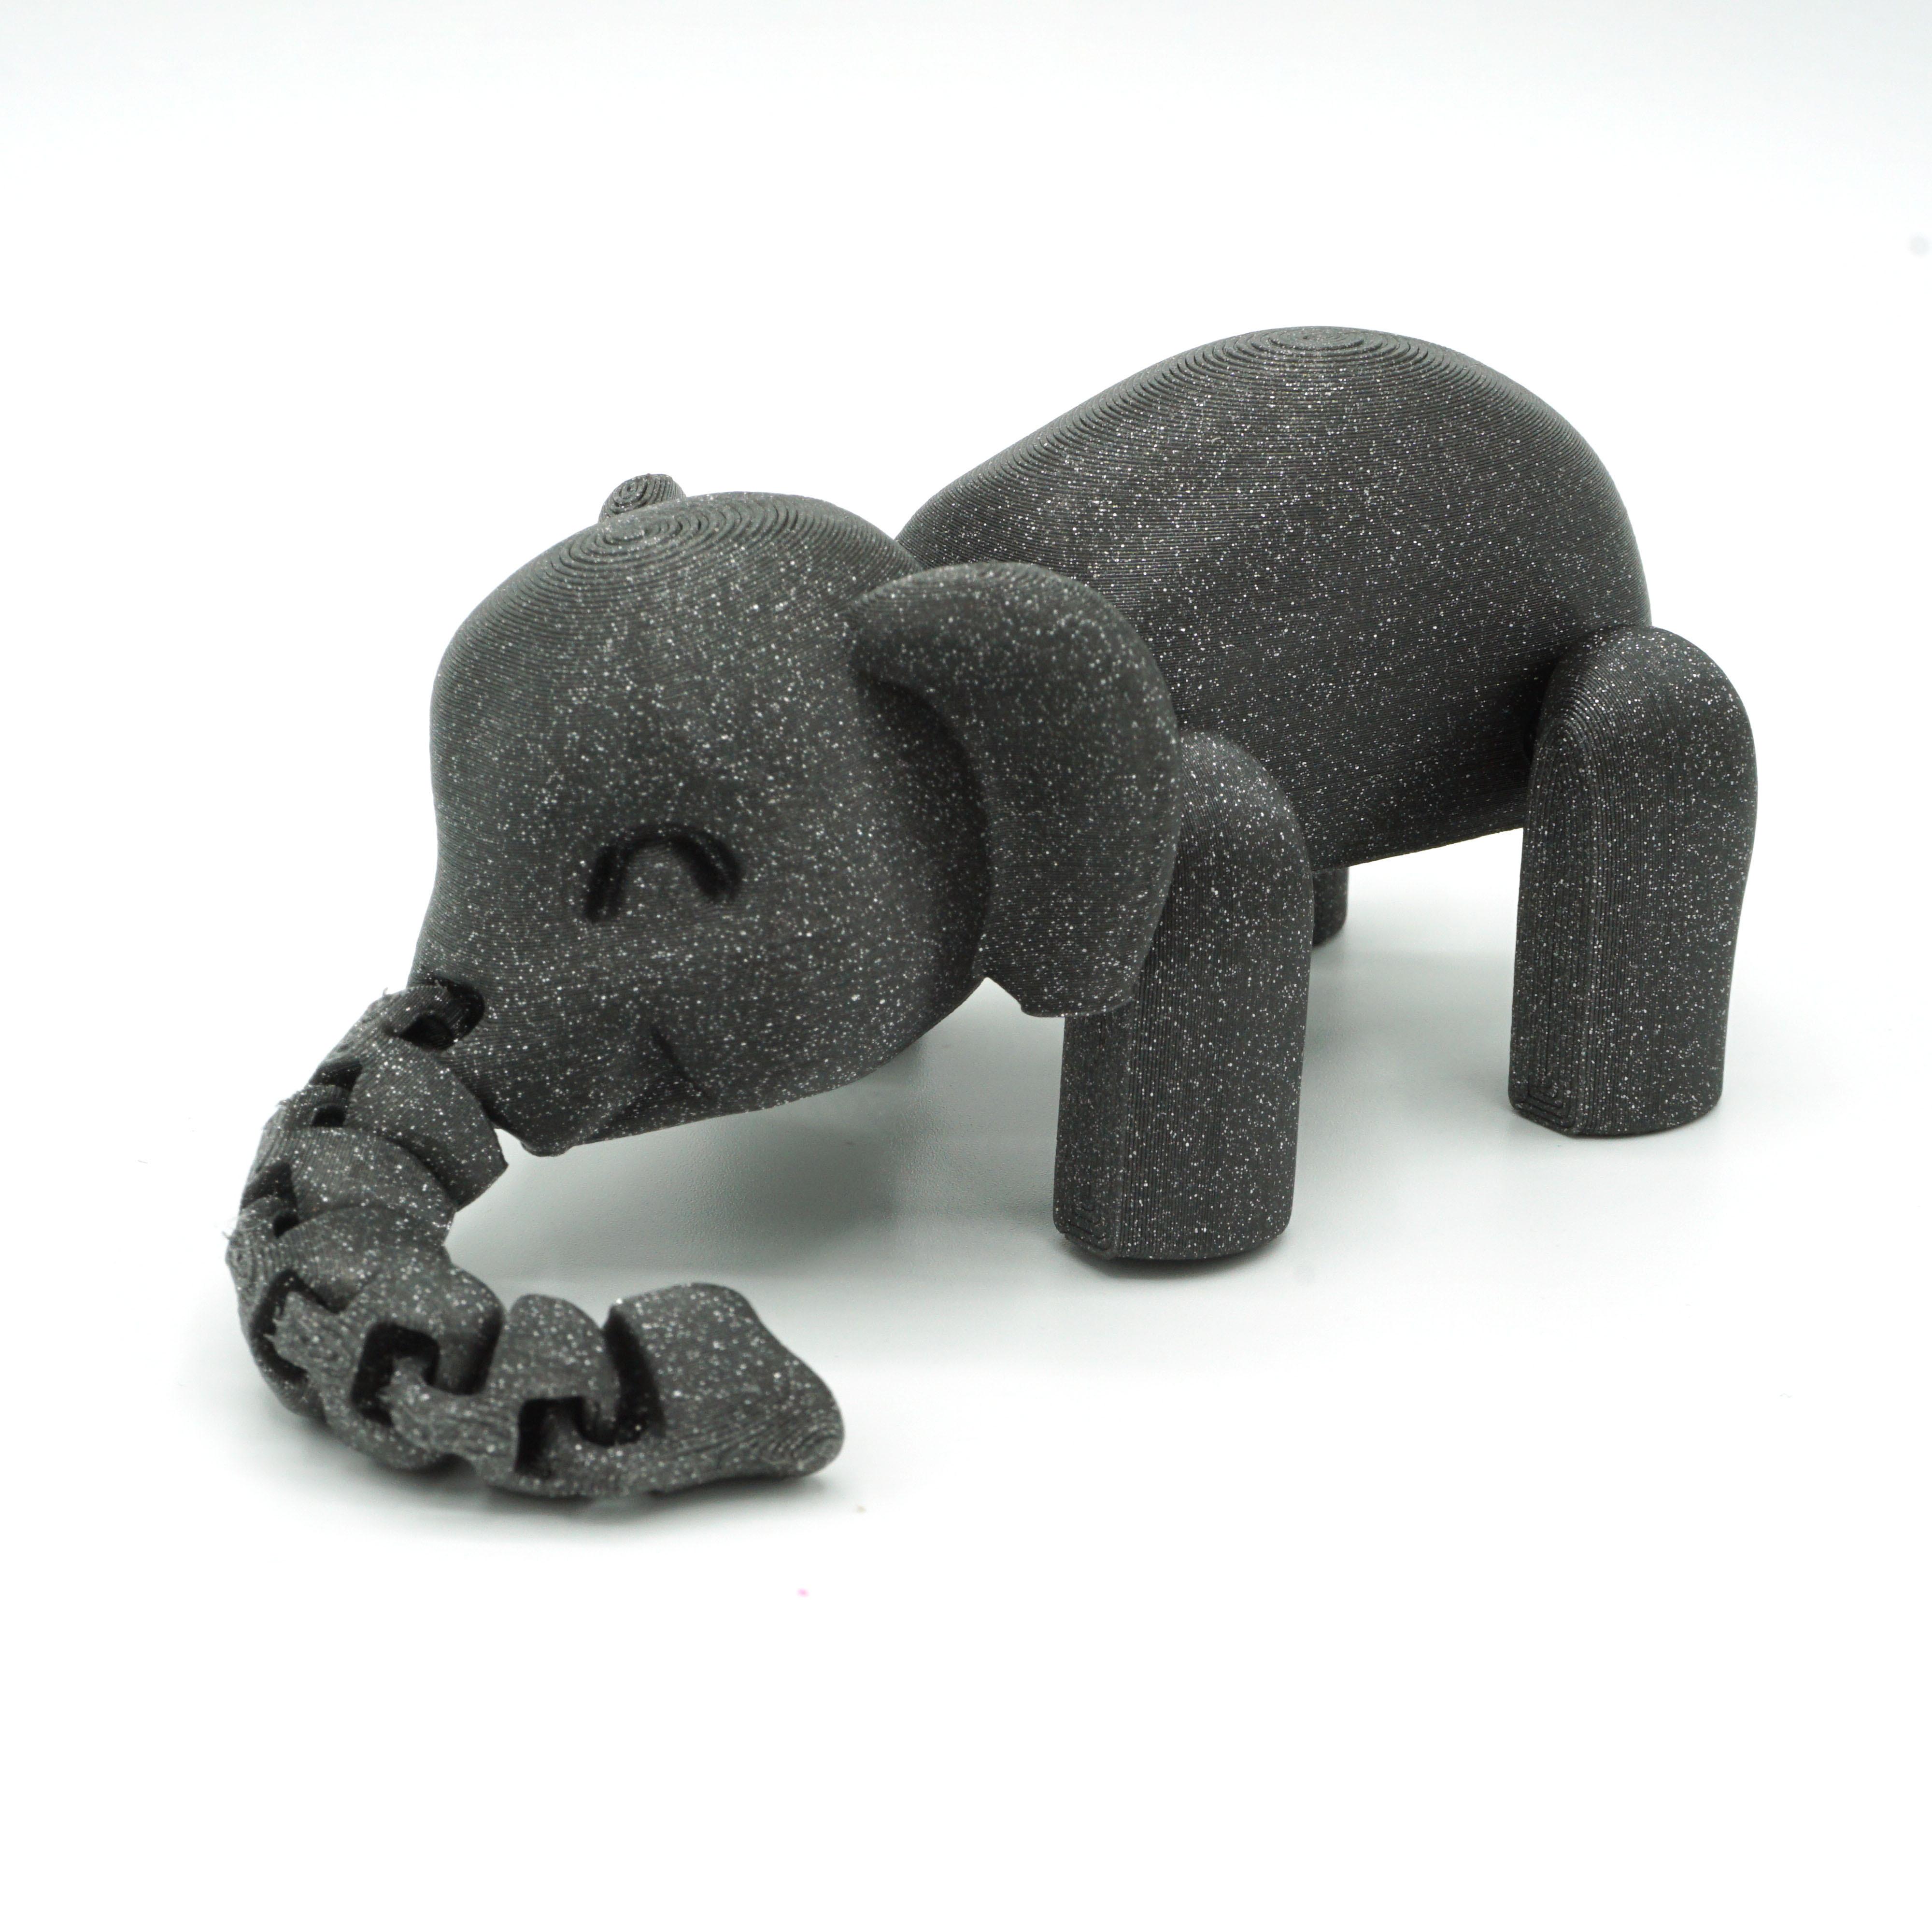 DSC01112 copia.jpg Download STL file Flexiphant • 3D printable model, mcgybeer